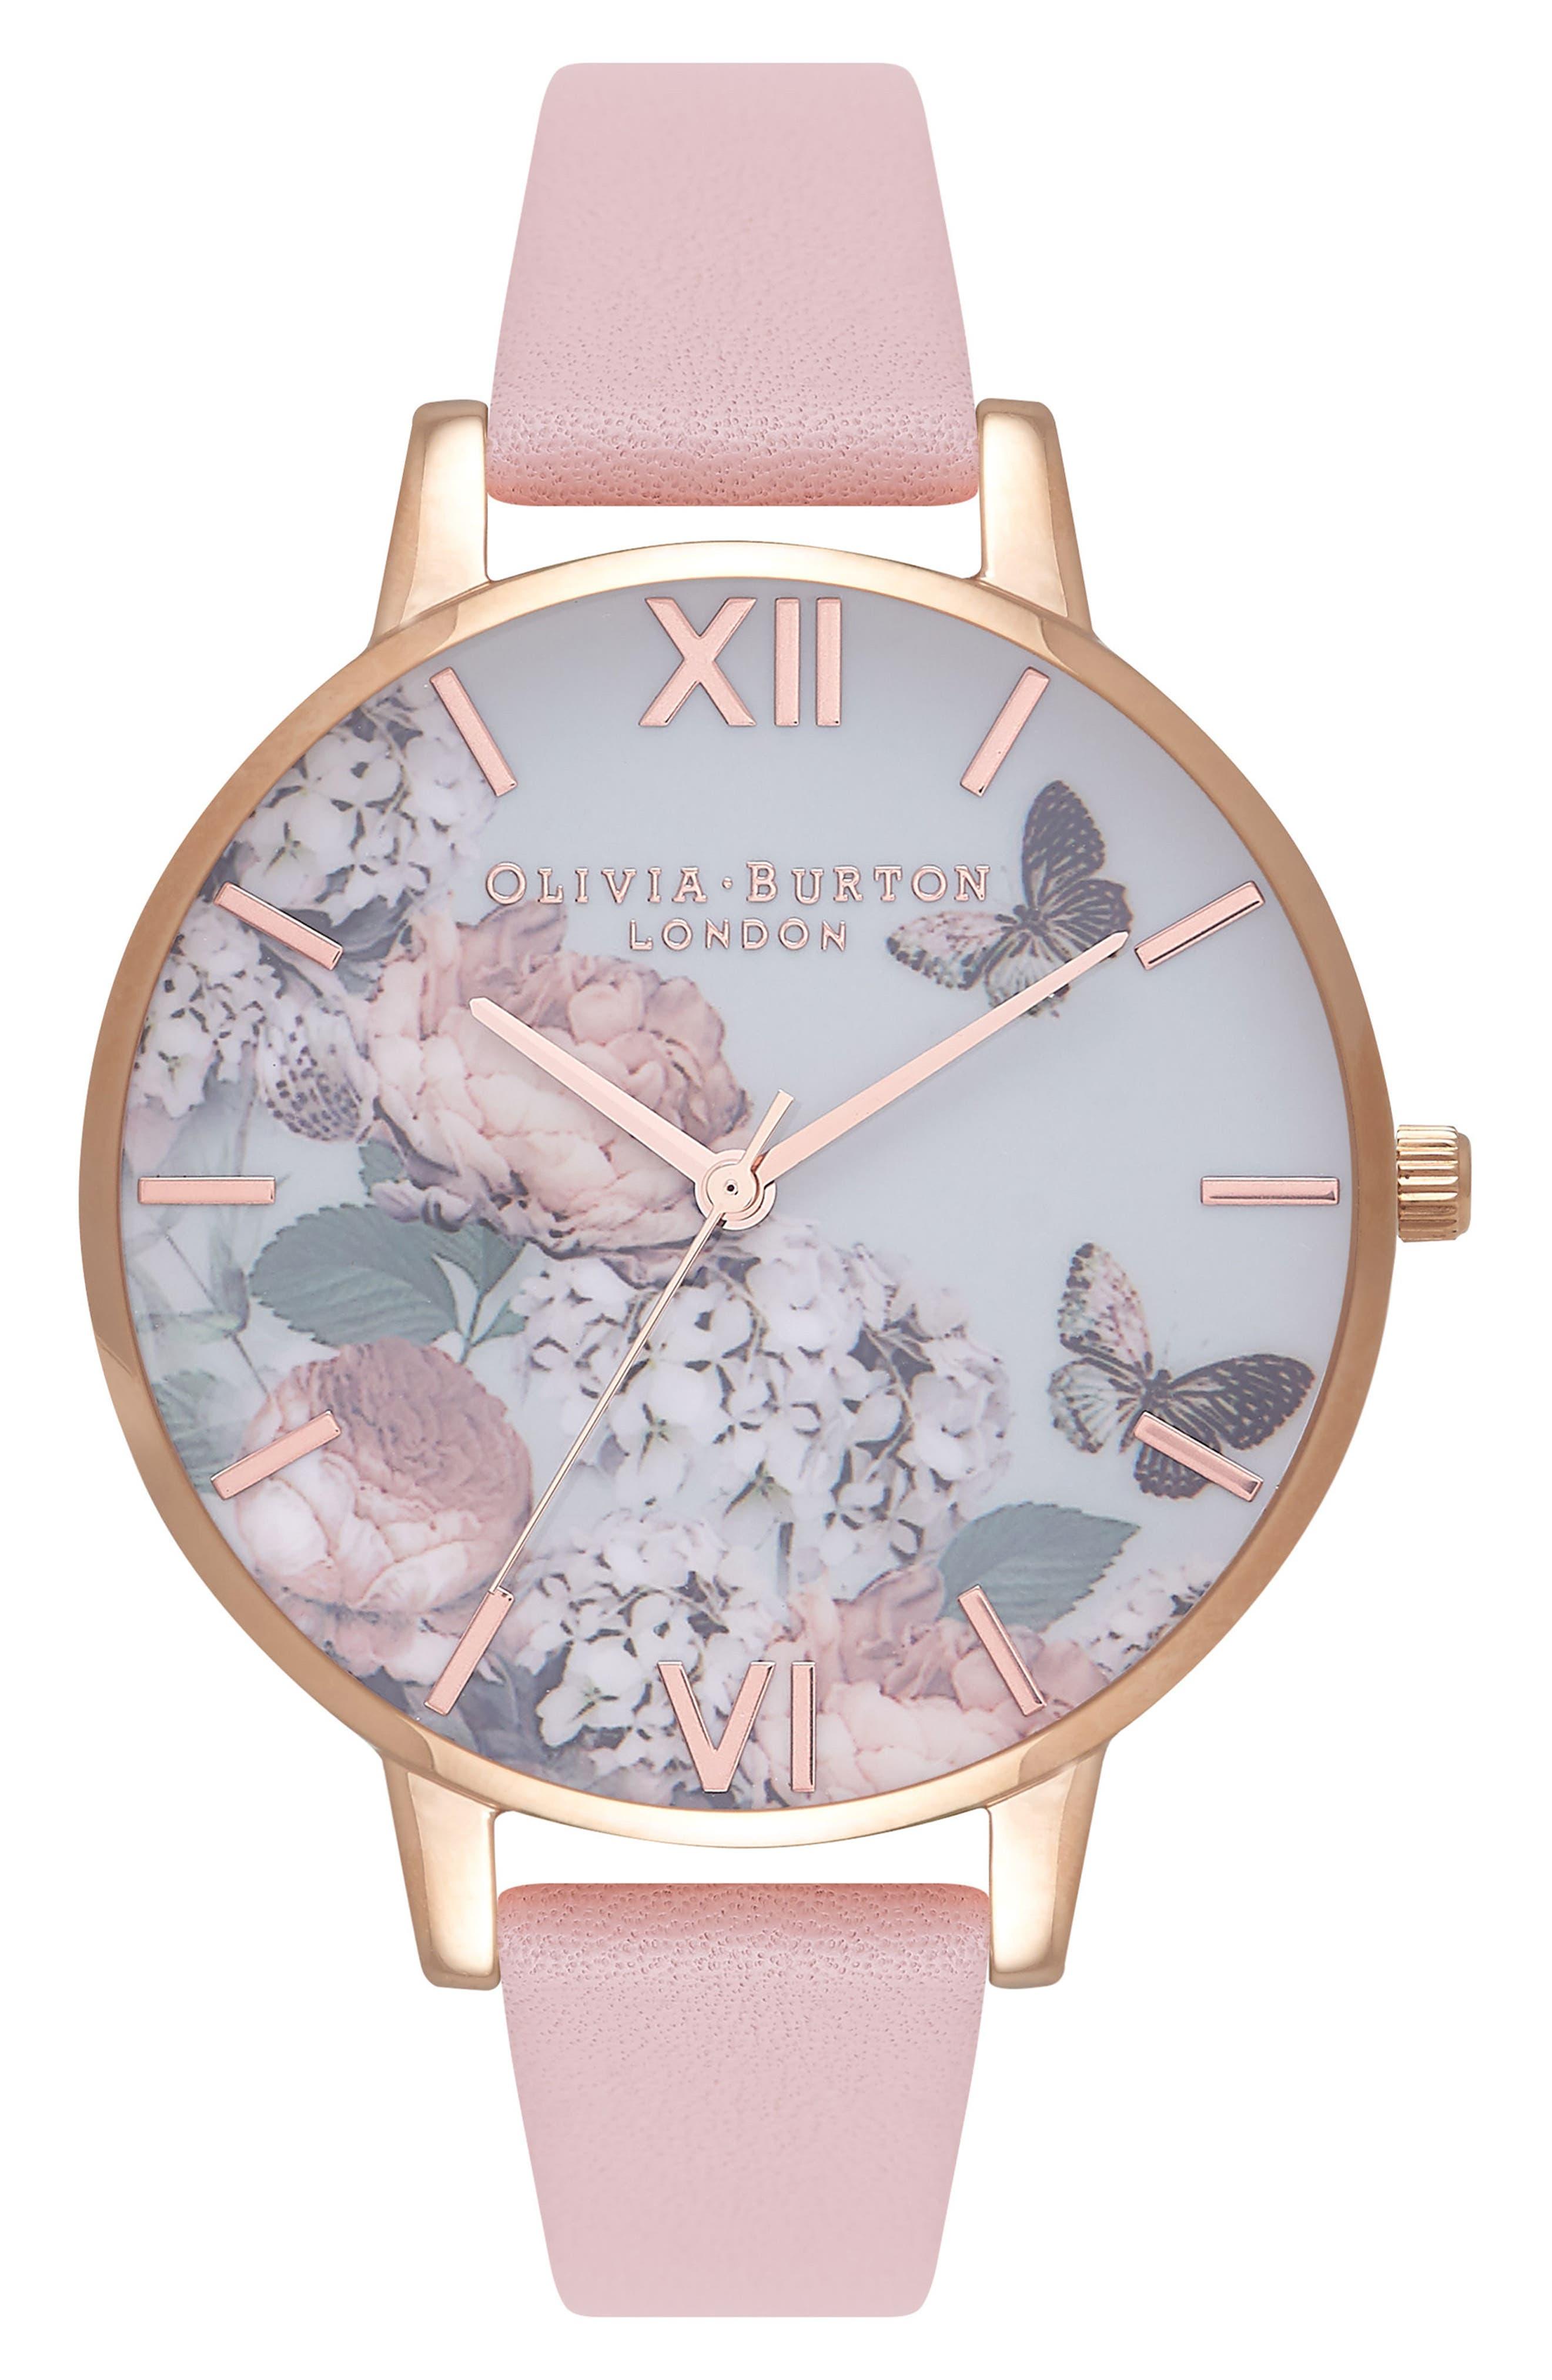 OLIVIA BURTON Signature Florals Leather Strap Watch, 38mm, Main, color, 650